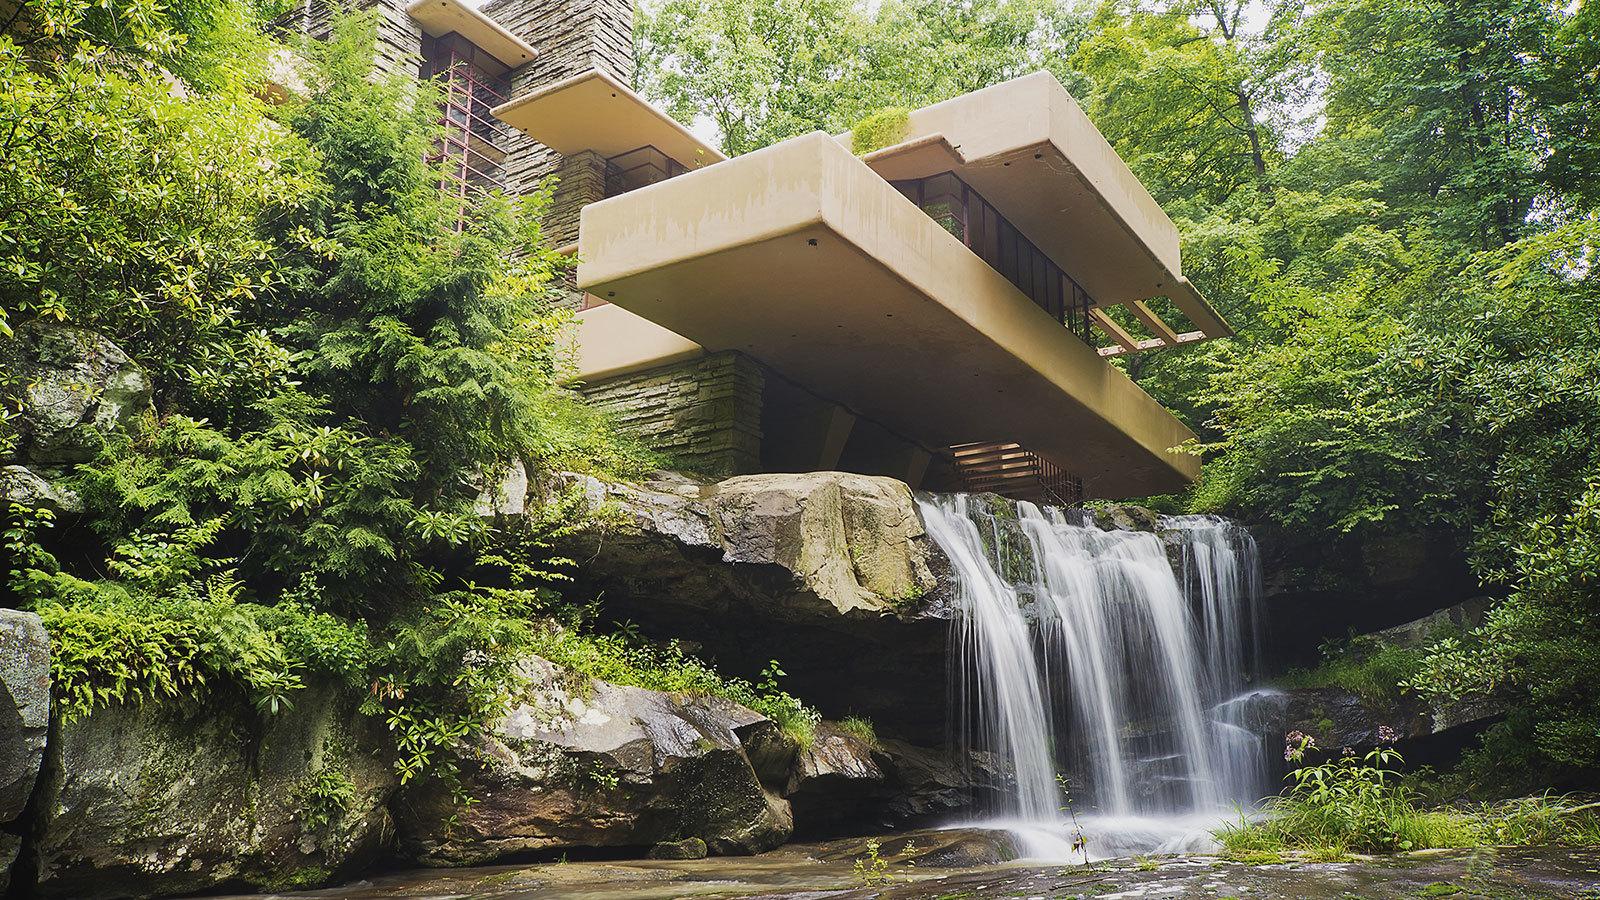 Vista dal basso della fallingwater house di Frank Lloyd Wright